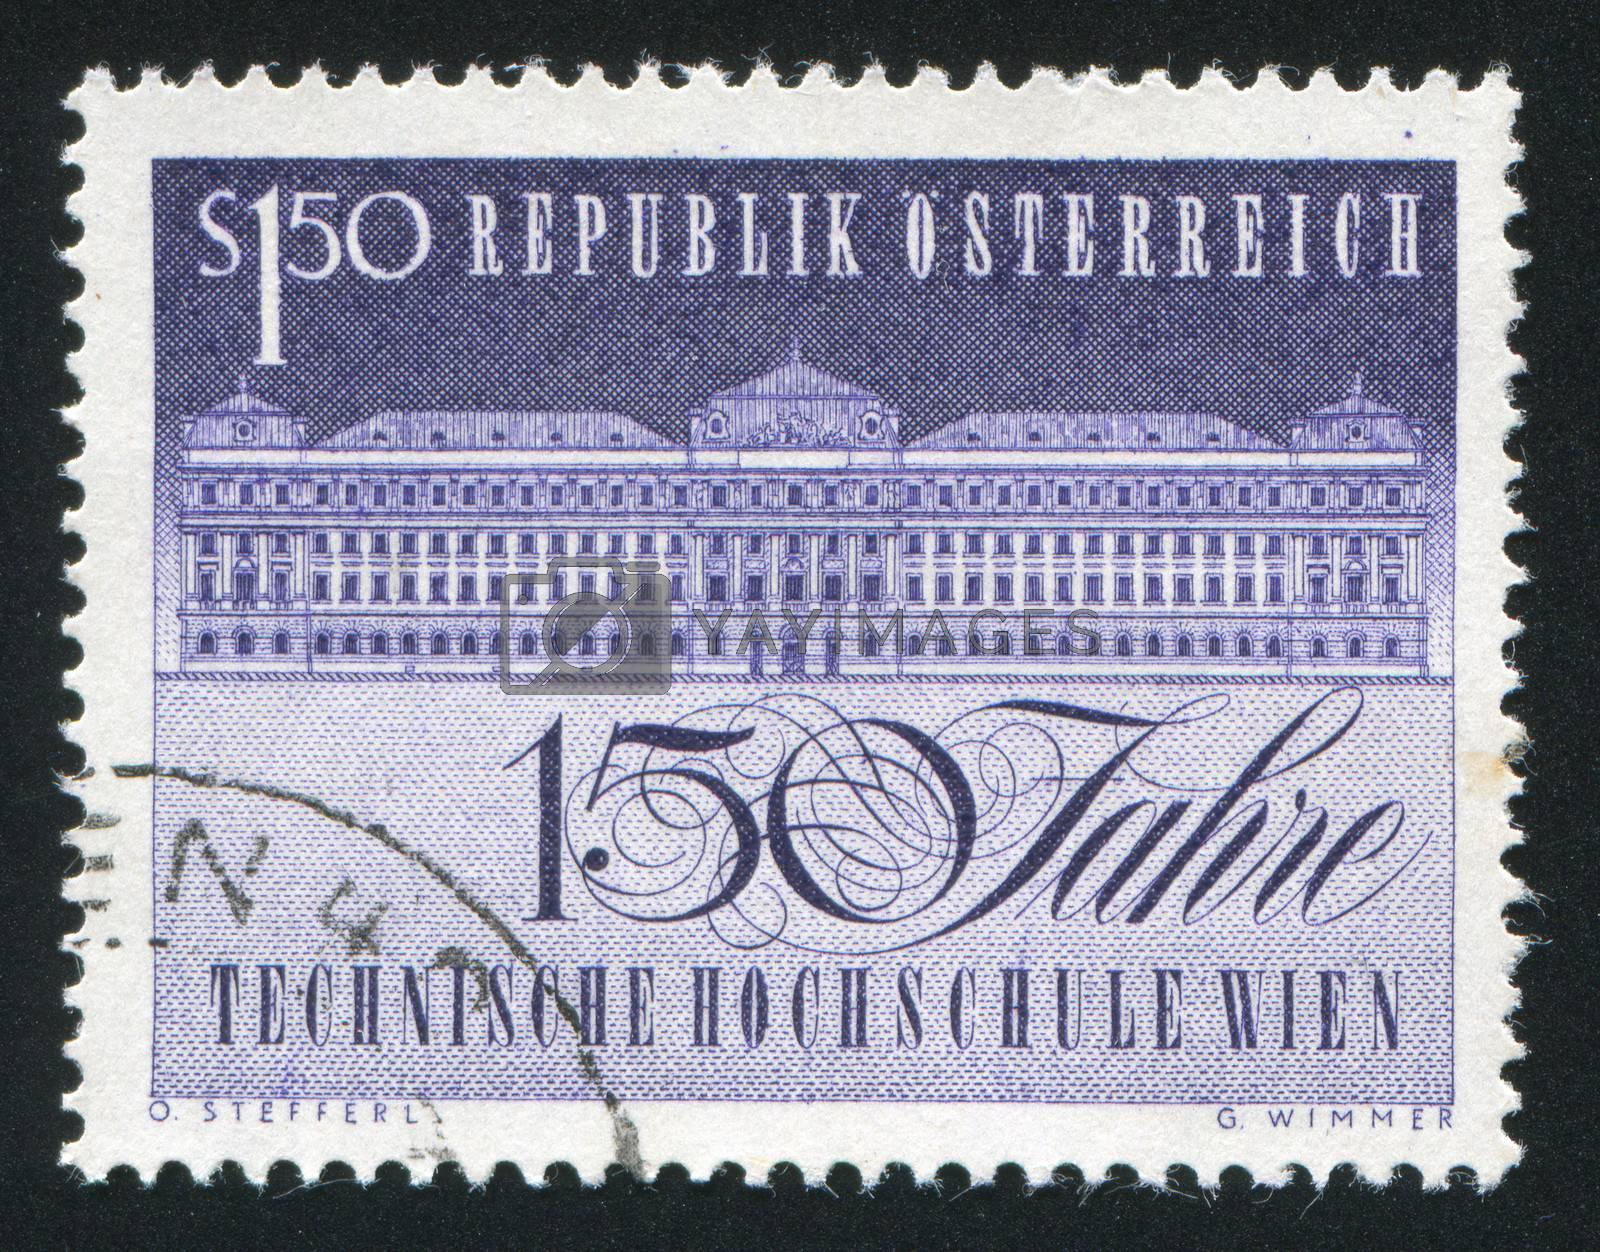 AUSTRIA - CIRCA 1965: stamp printed by Austria, shows University of Technology, circa 1965